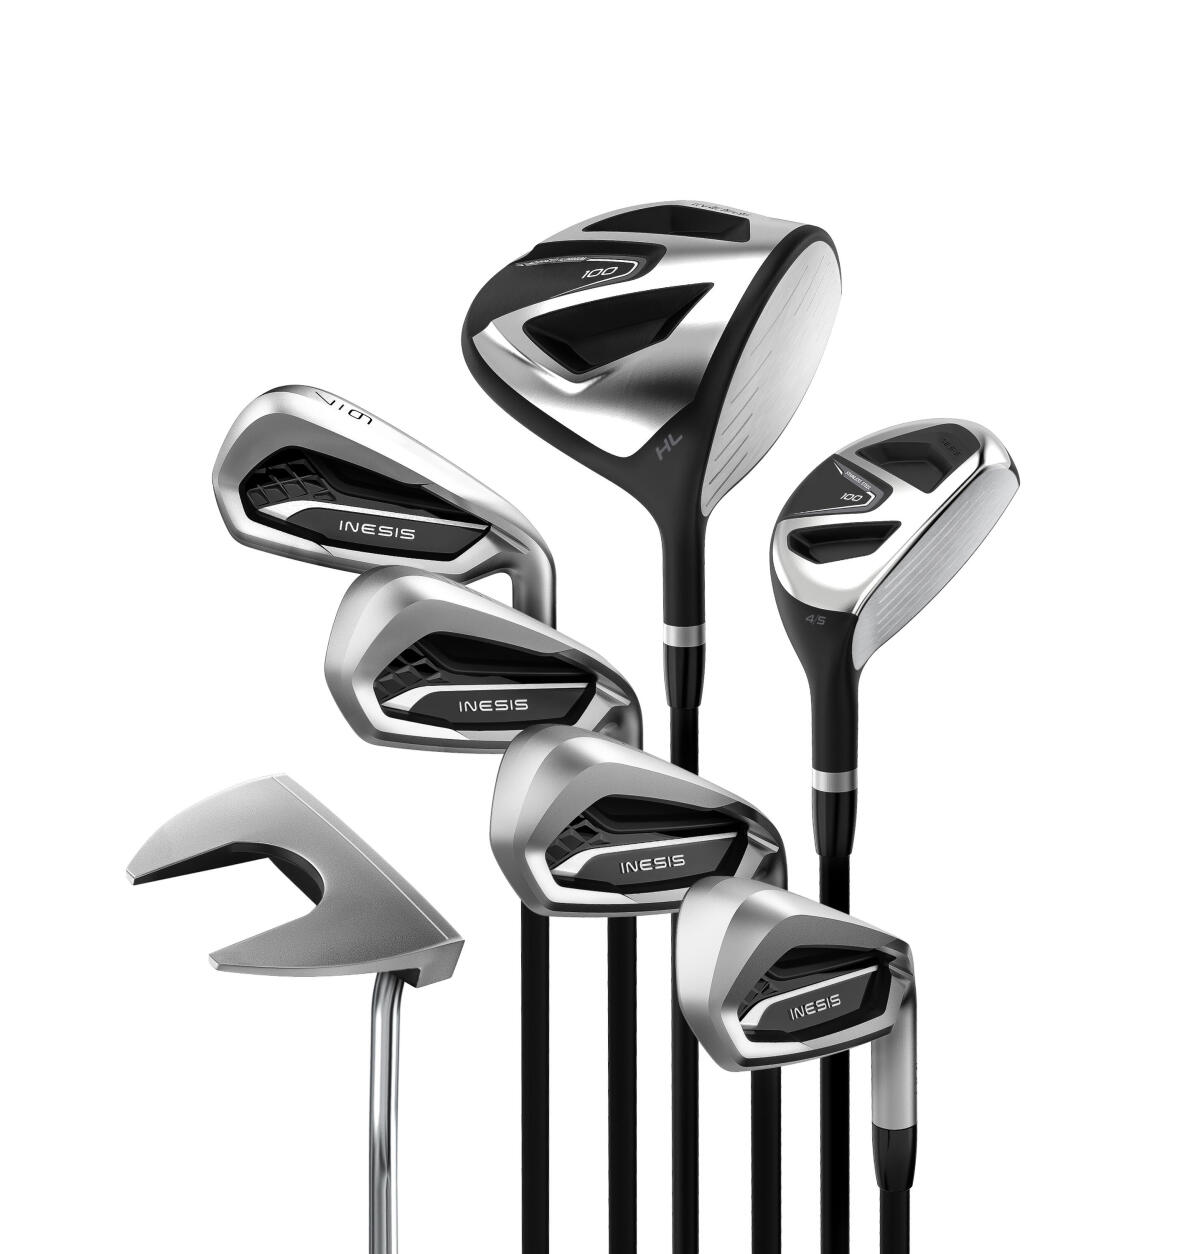 Comment organiser son sac de golf ?